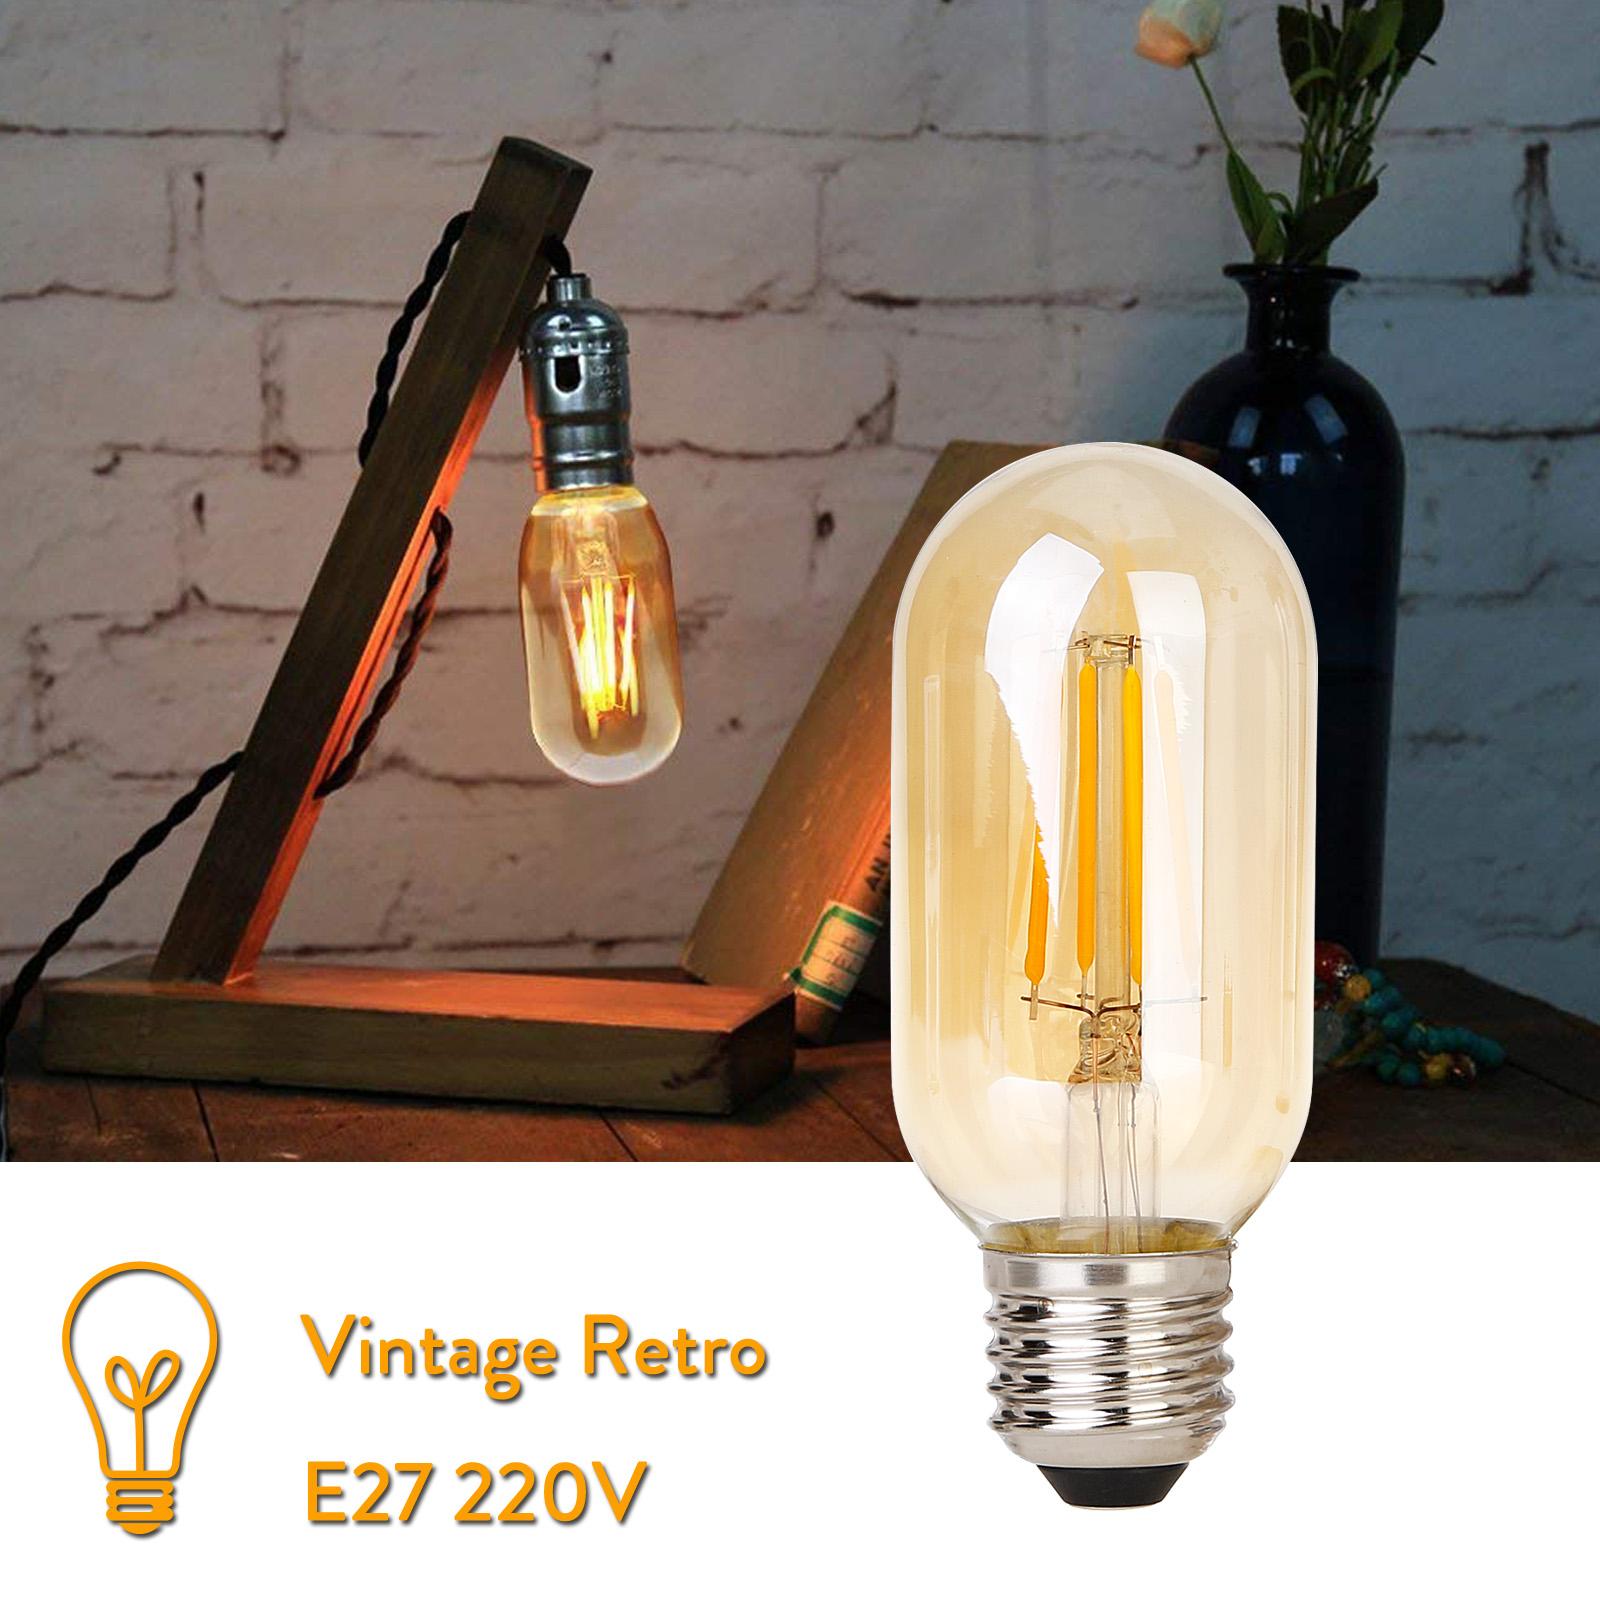 T45 4W E27 Vintage Retro LED COB Glühbirne Warmweiß 220V 30W Äquivalent Lampe